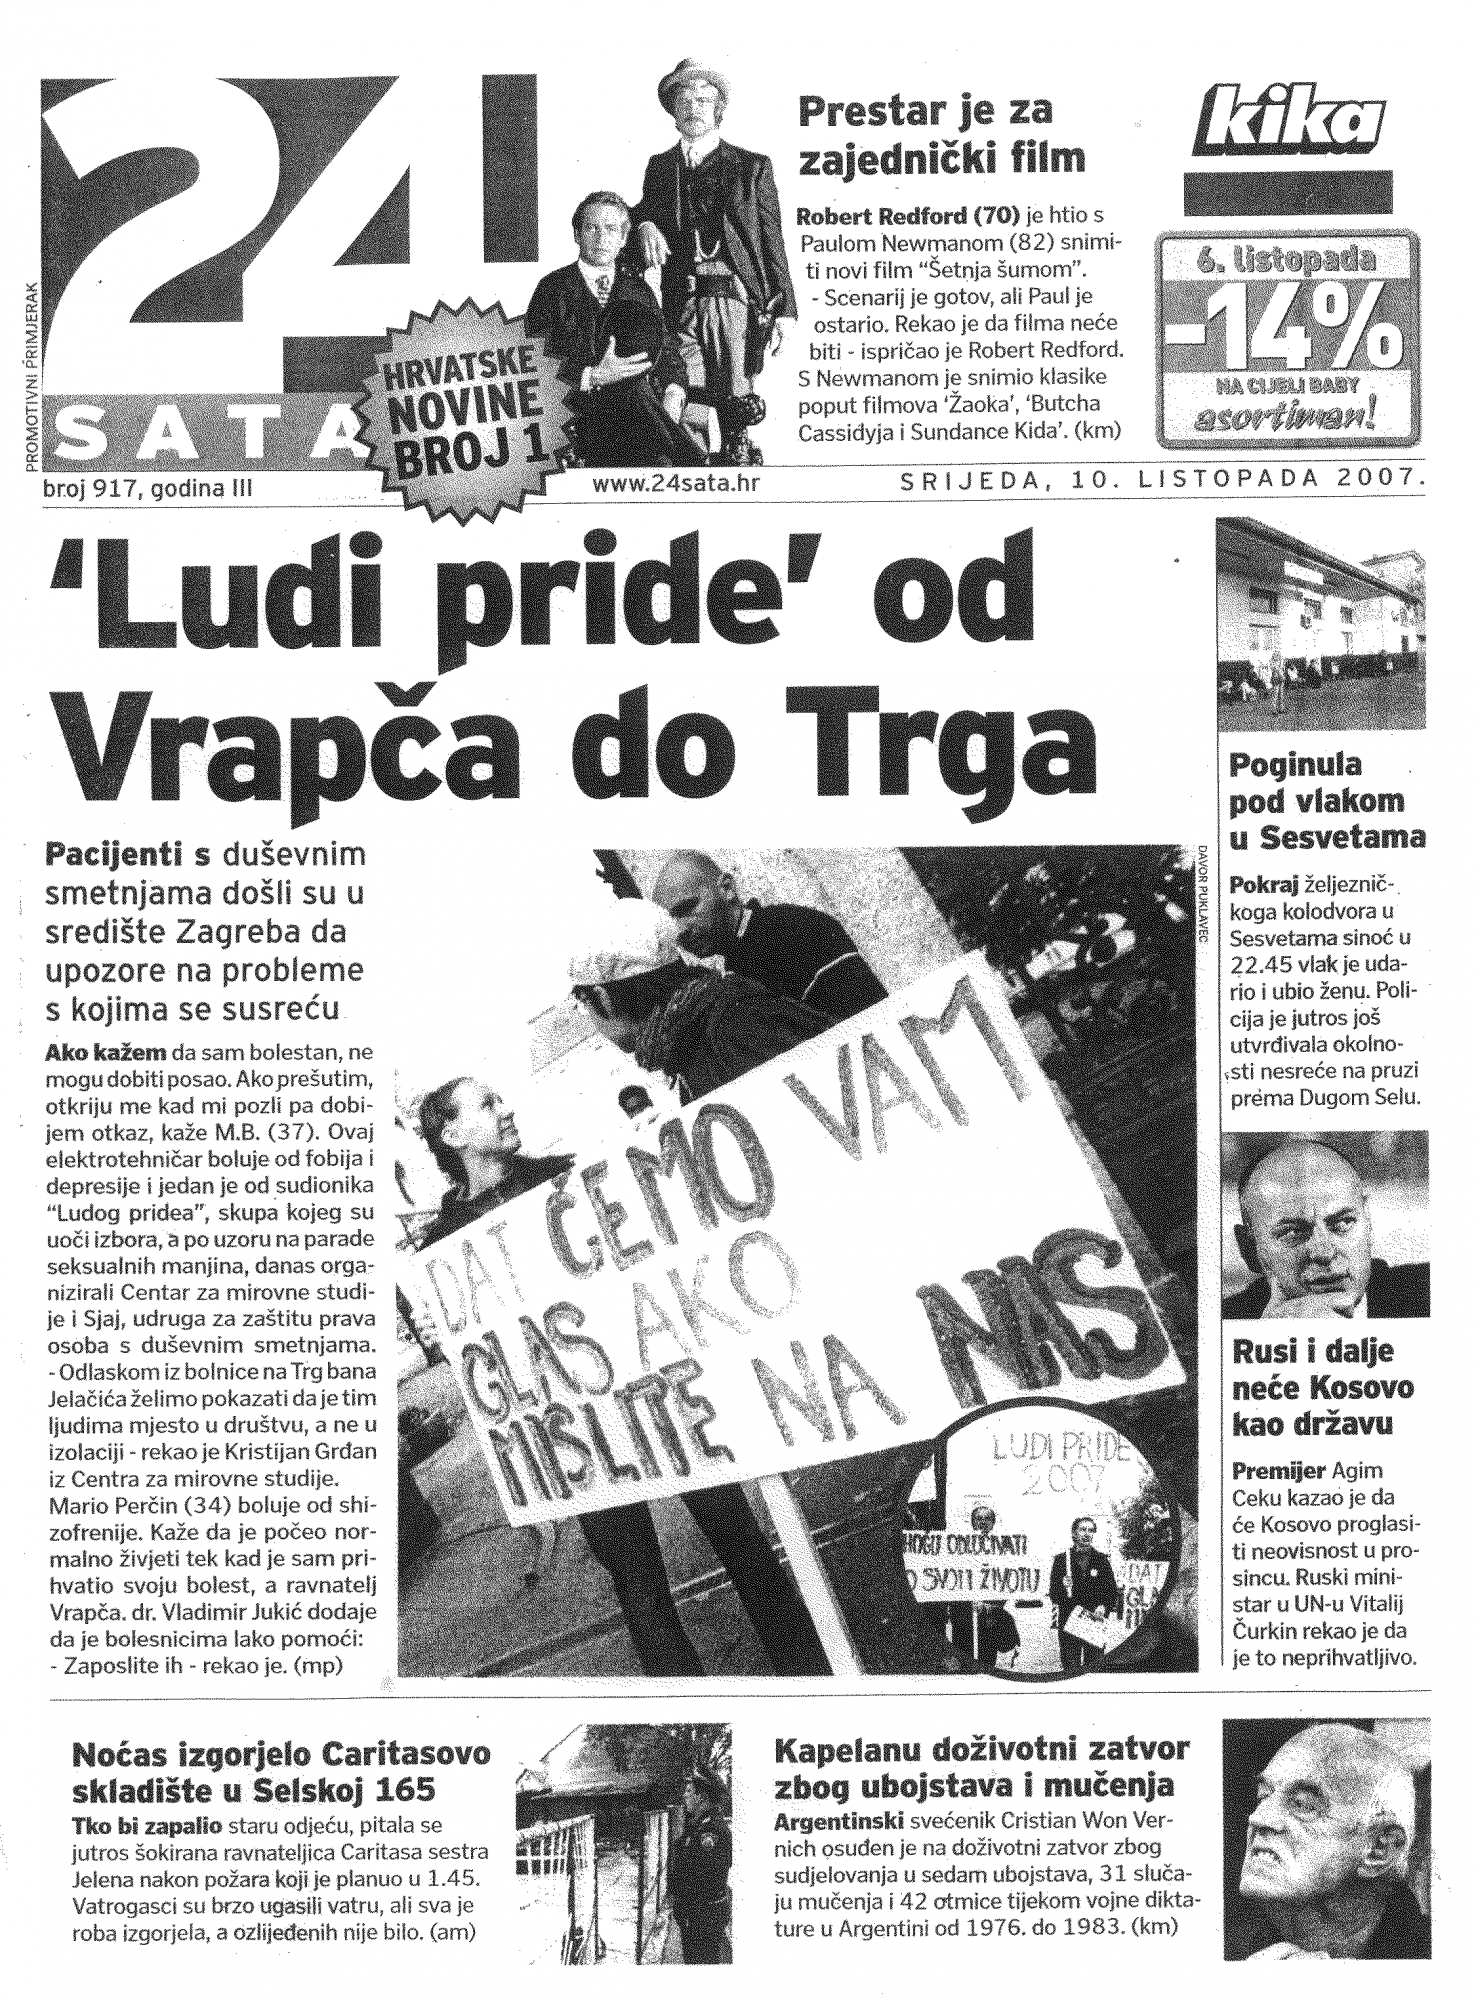 2007 LUDI PRIDE - NOVINE 24 SATA